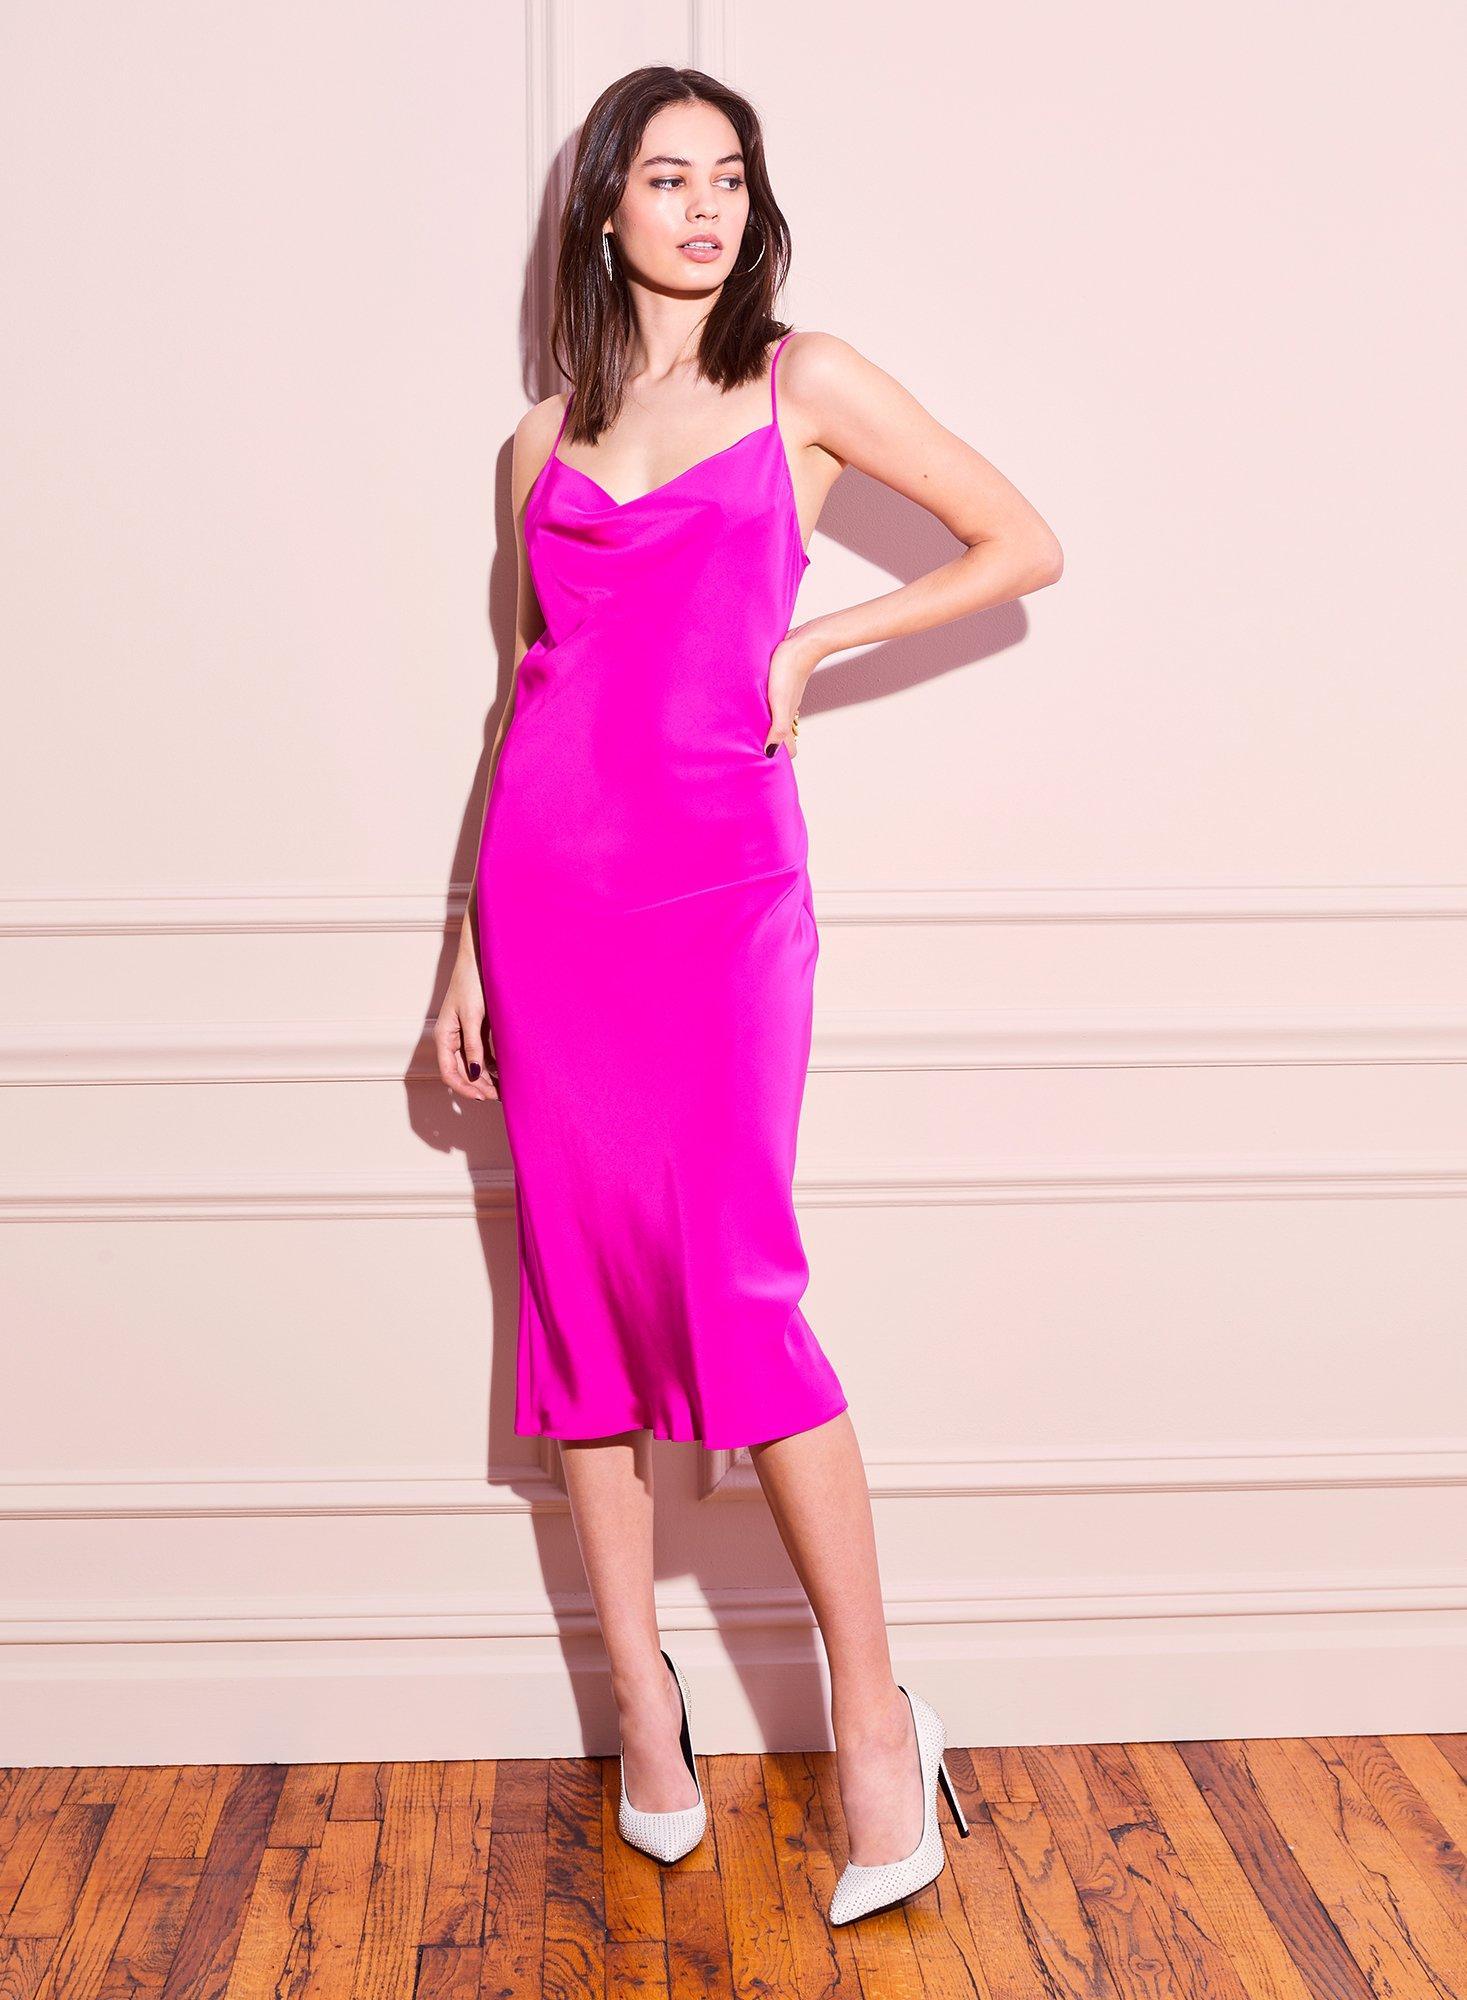 89d4b5a88091 Lyst - Fleur du Mal Cowl Neck Slip Dress in Pink - Save 25%